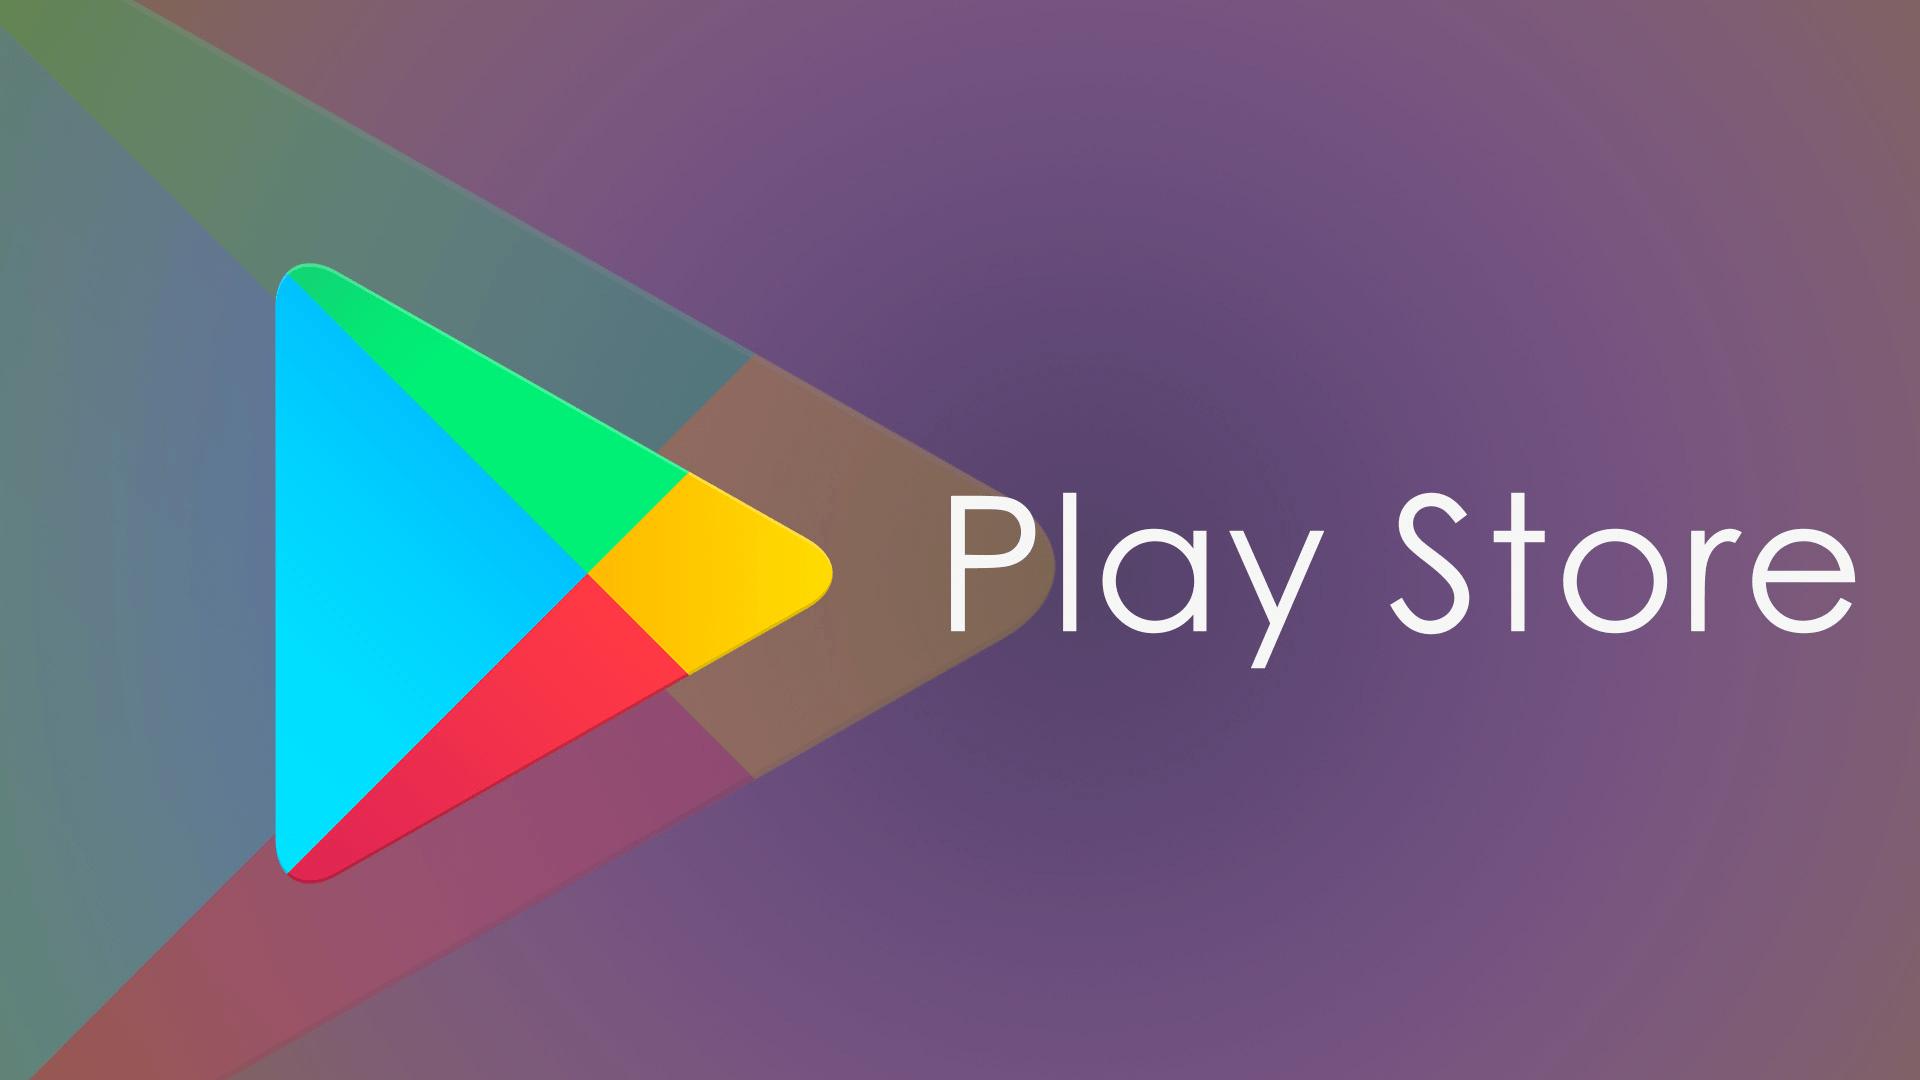 google play store ucretsiz oyun ve uygulama